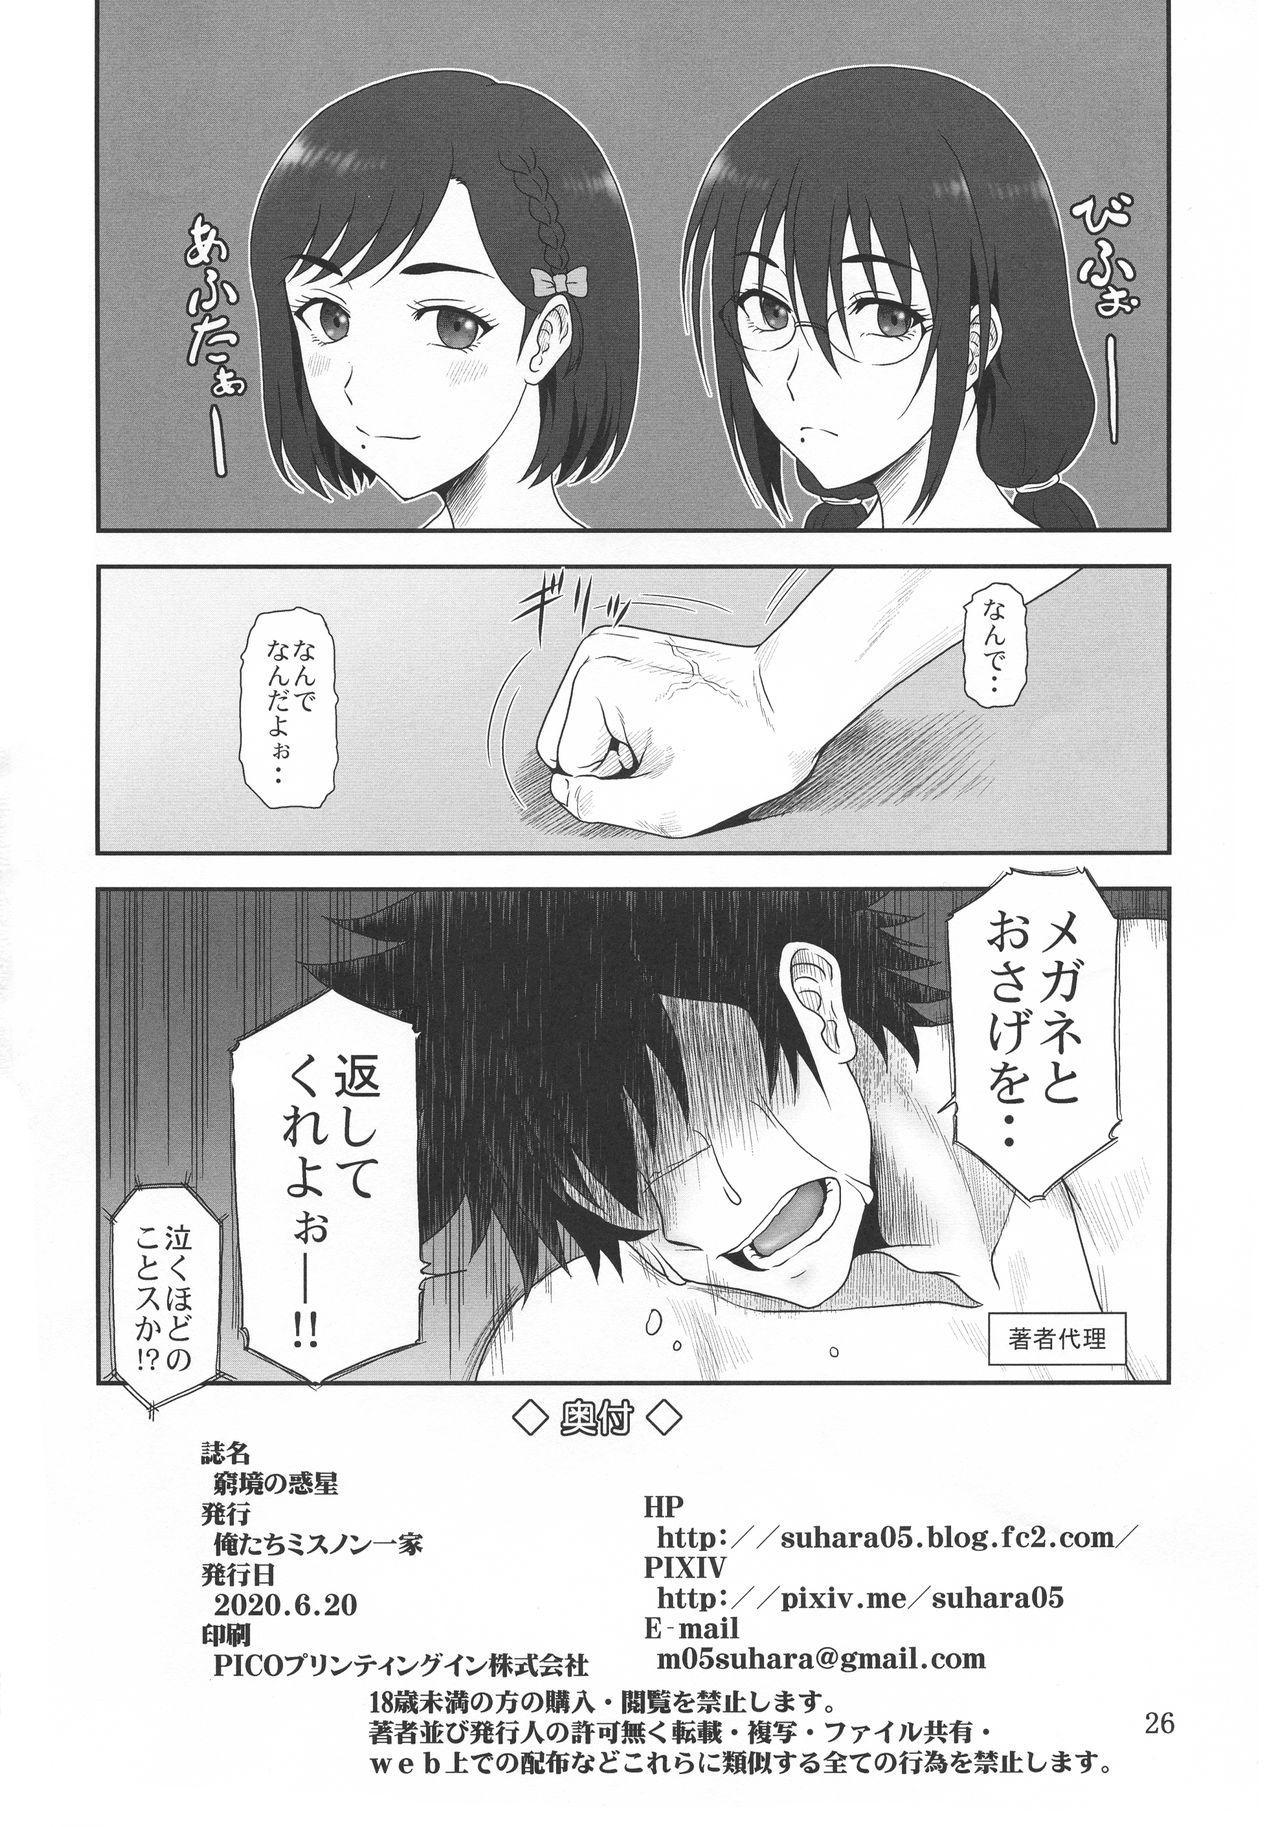 Kyuukyou no Wakusei - Planet of plight 24